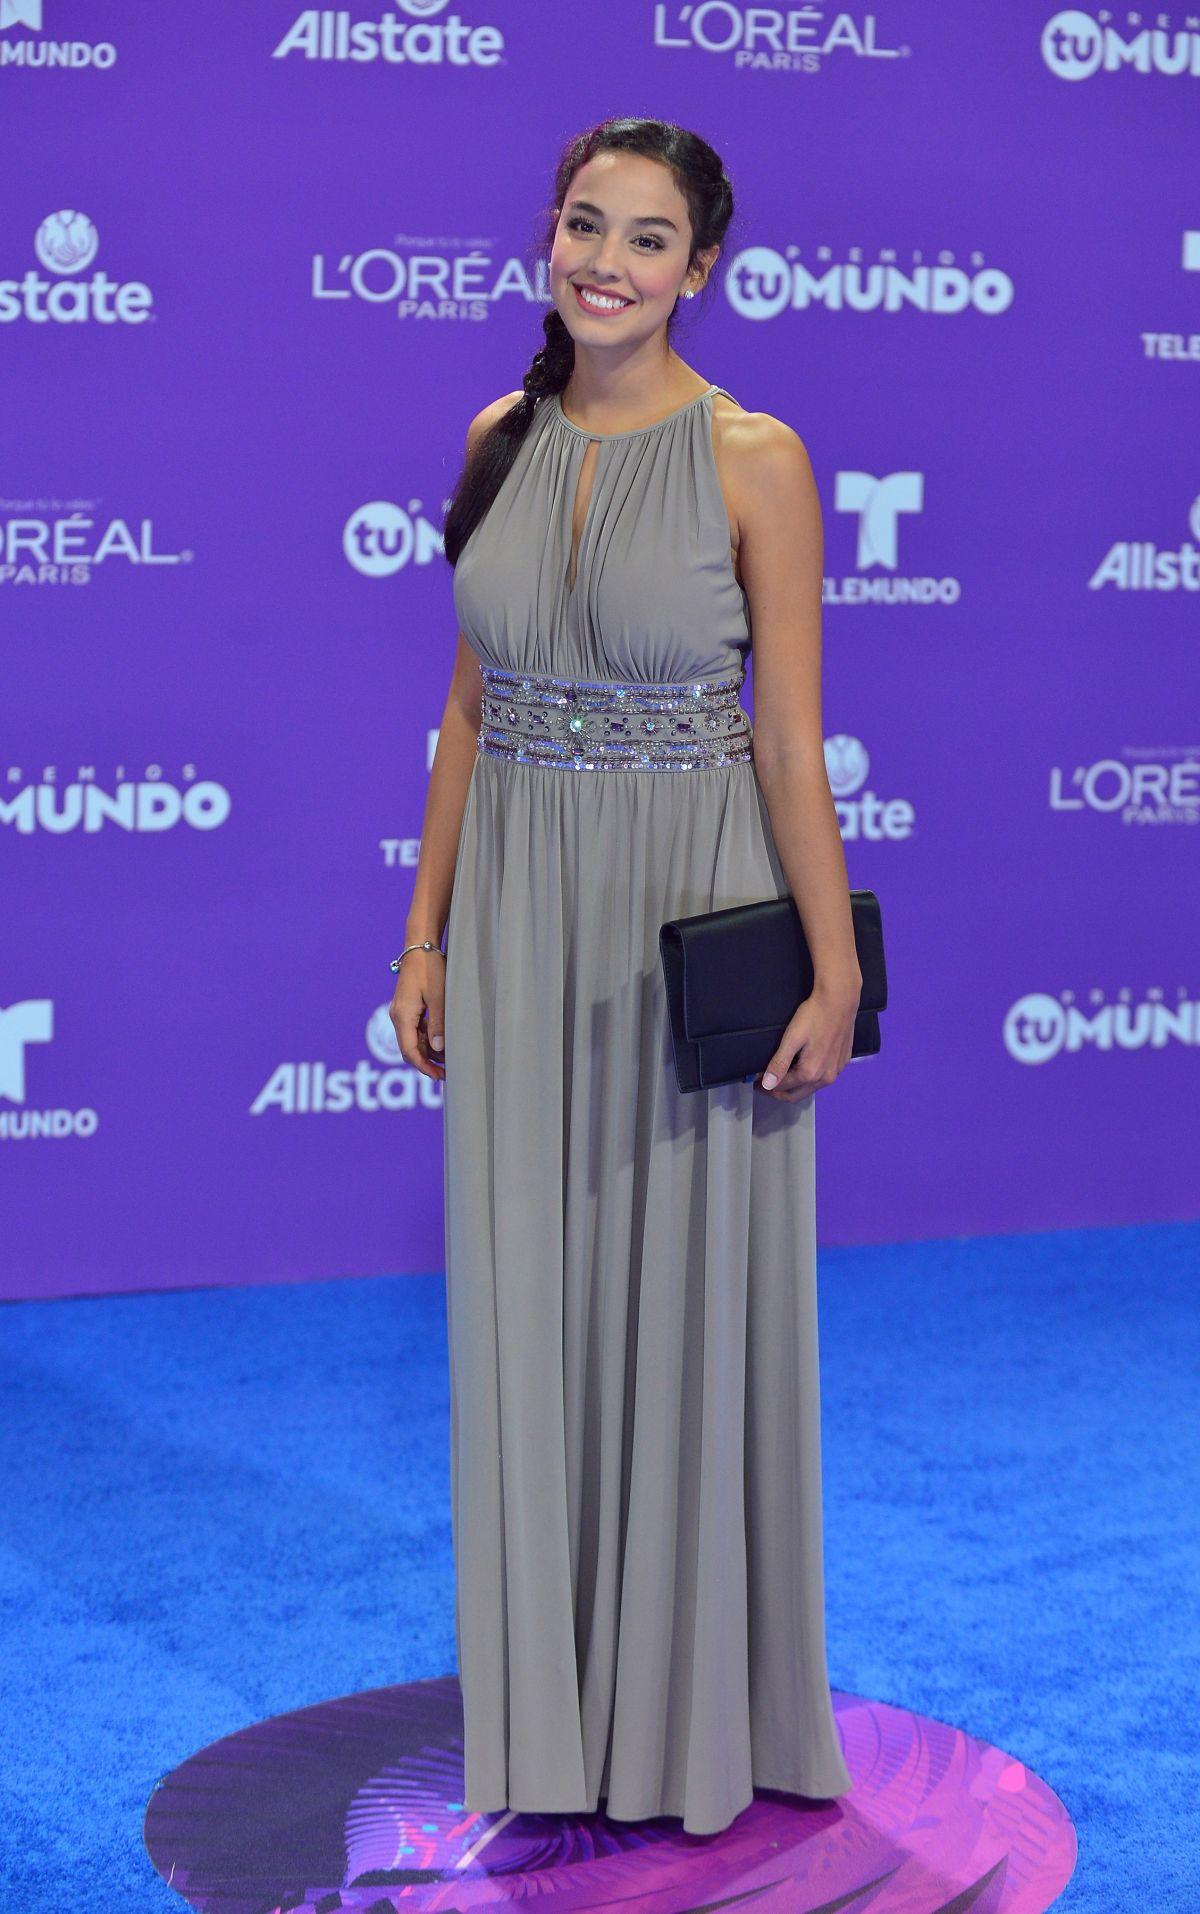 ANA MARIA ESTUPINAN at Telemundo